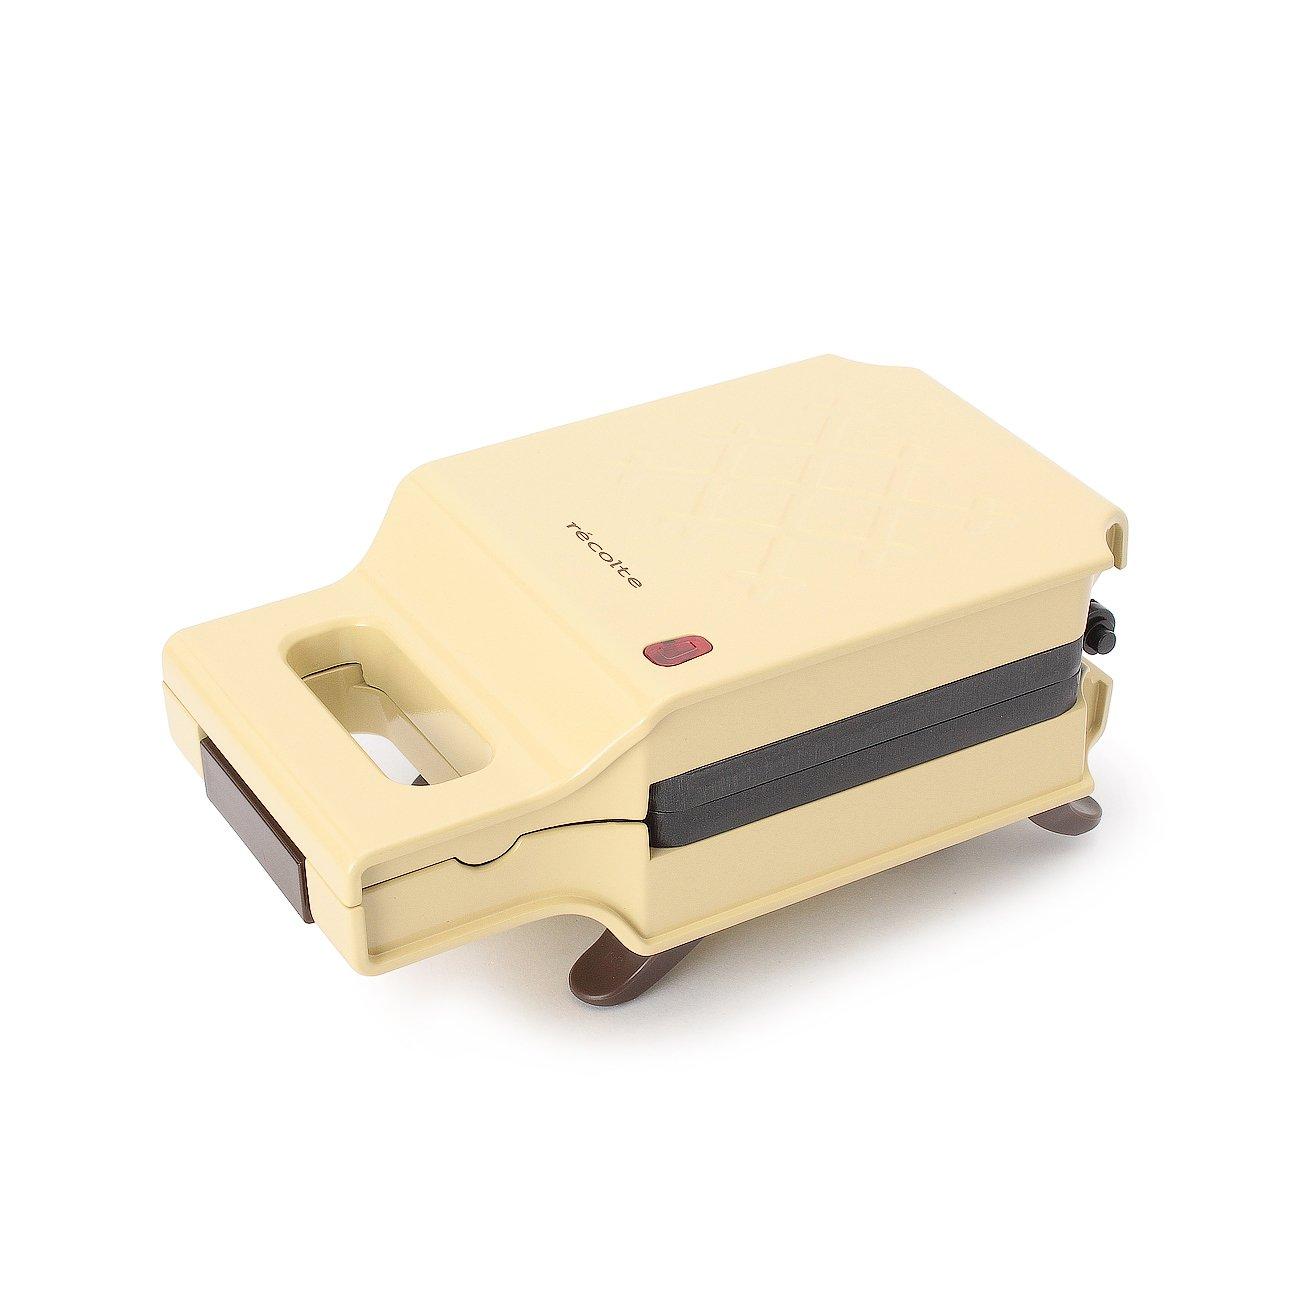 recolte PRESS SAND MAKER Quilt RPS-1 (BE) (beige) rps1